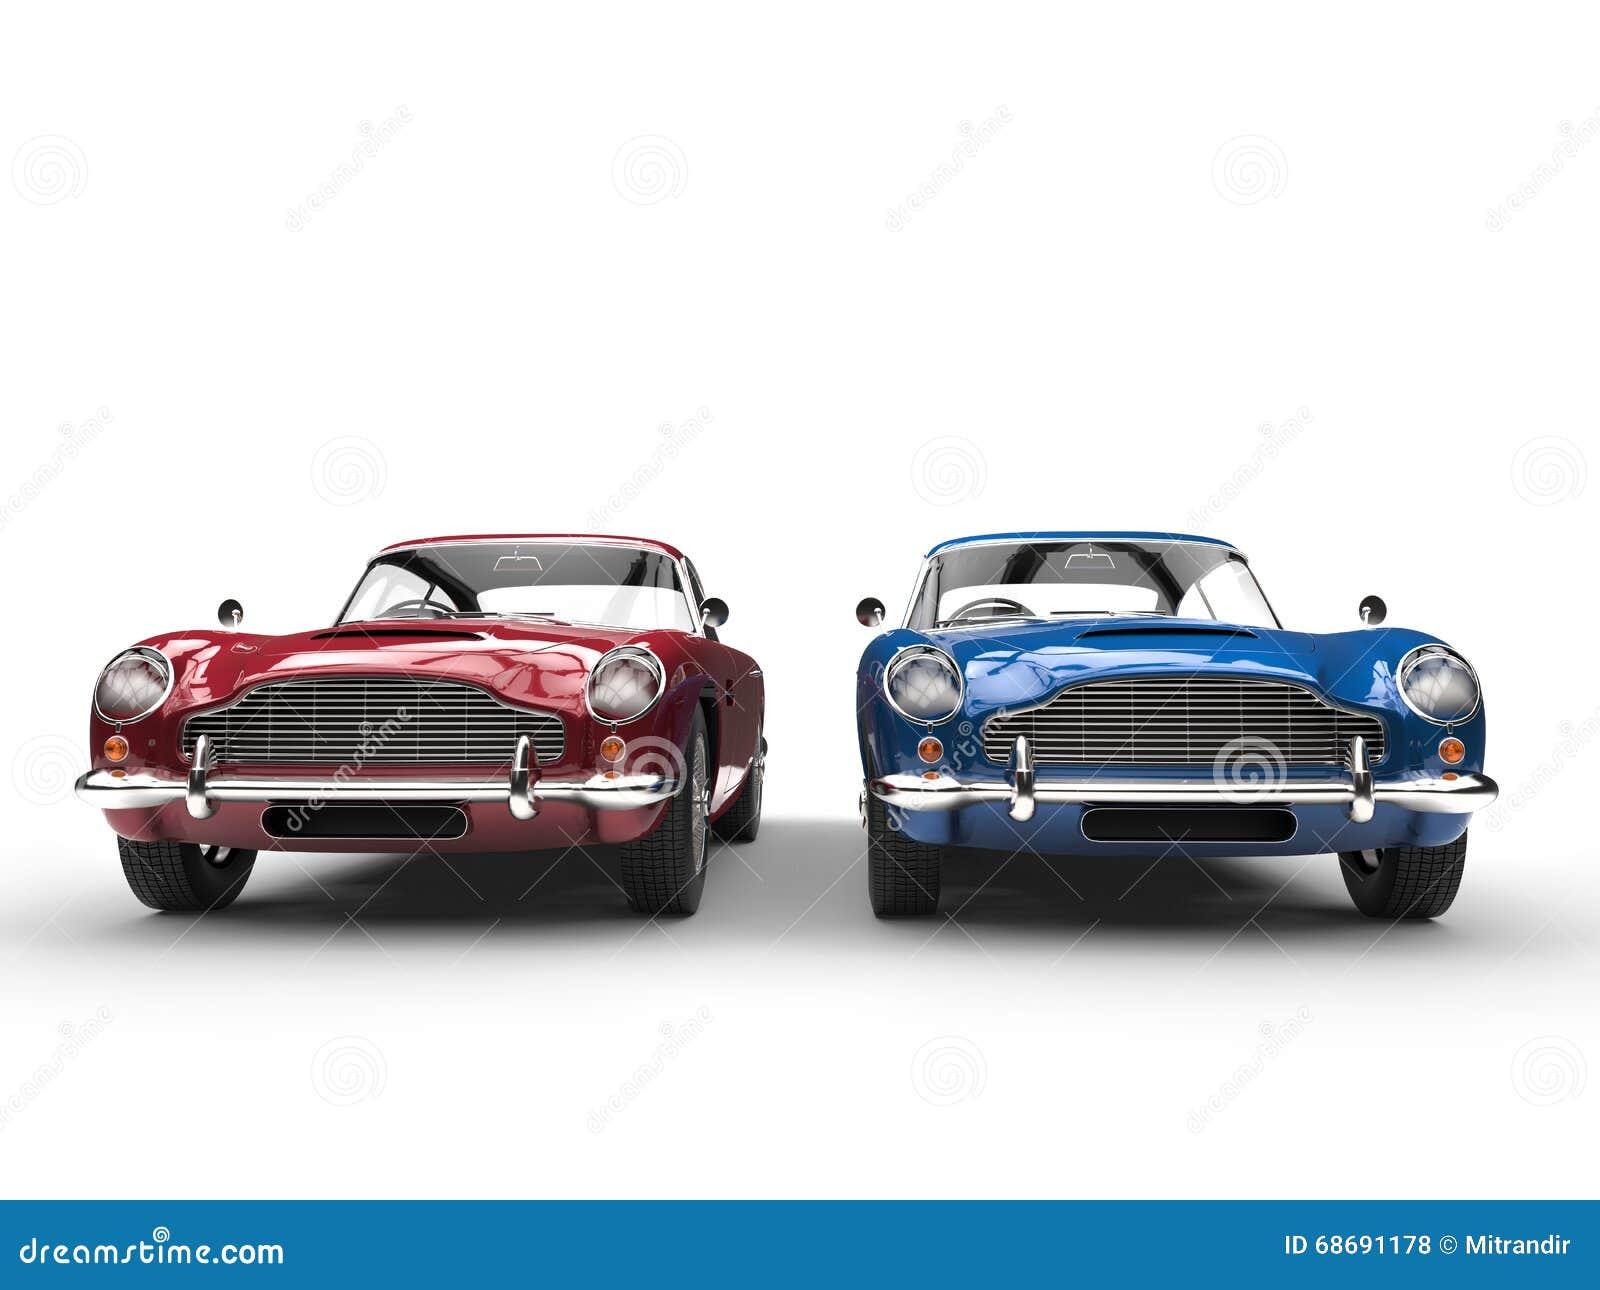 red and blue metallic vintage cars front view stock illustration image 68691178. Black Bedroom Furniture Sets. Home Design Ideas